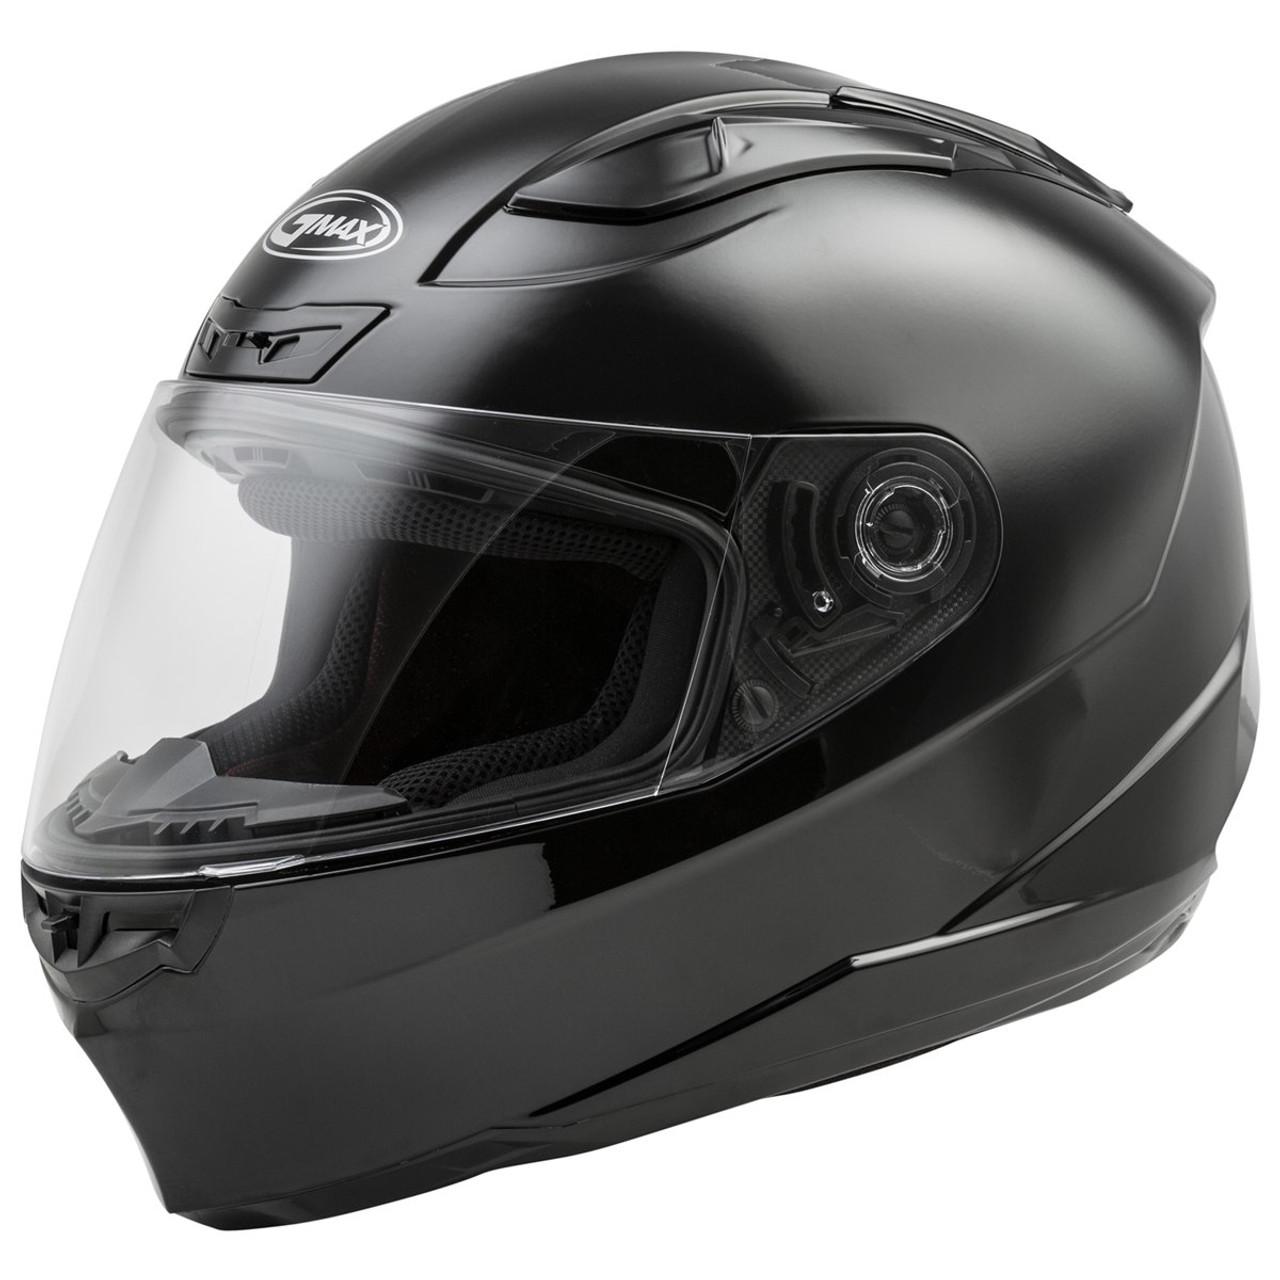 c7f0e3f7 GMax FF88 Helmet - Team Motorcycle